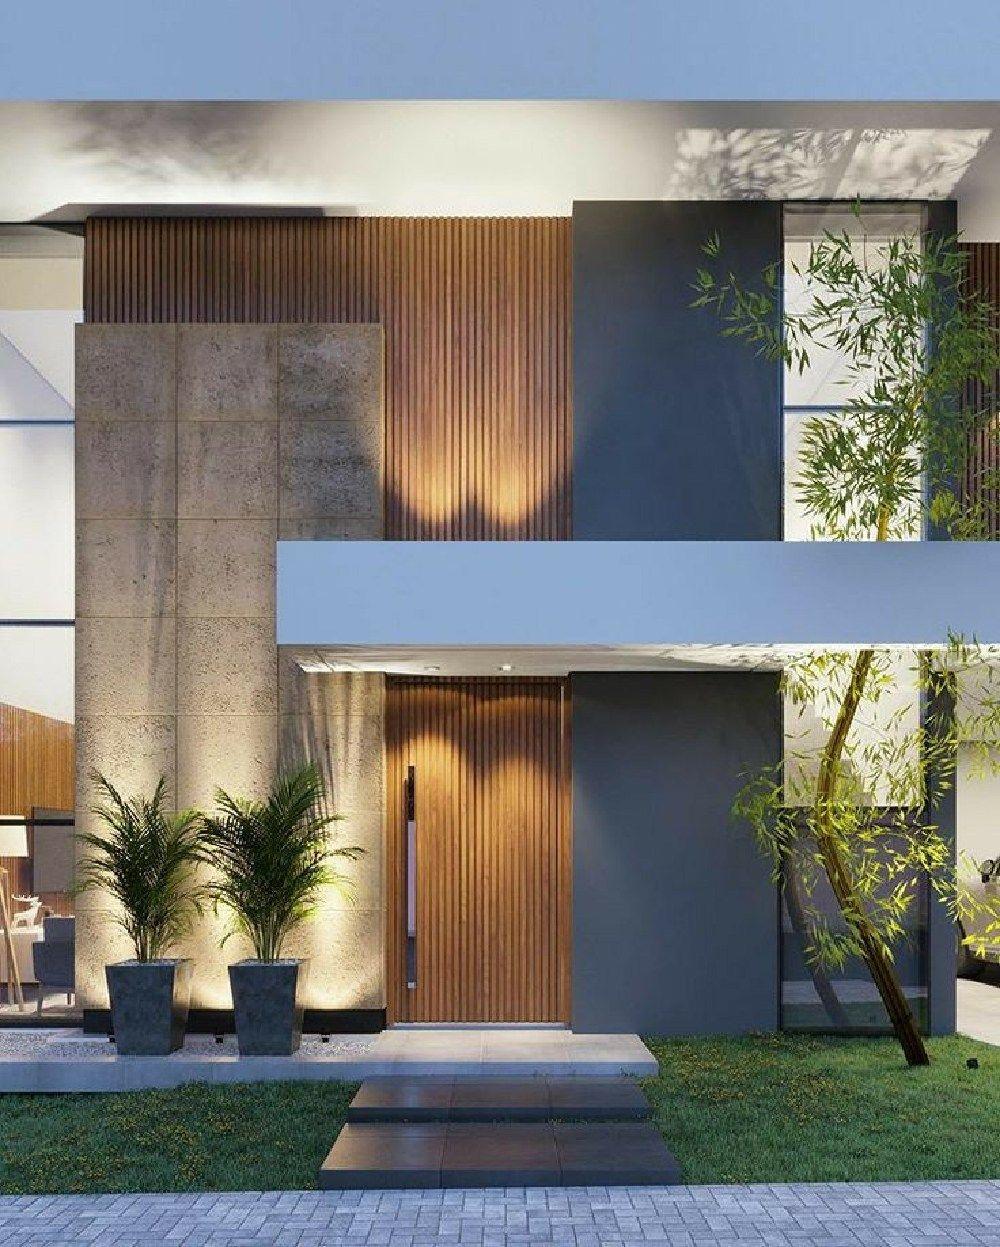 25 Best Outside Wall Art Design Ideas For Exterior Home Decorhead Com In 2020 House Exterior Facade House Modern House Exterior